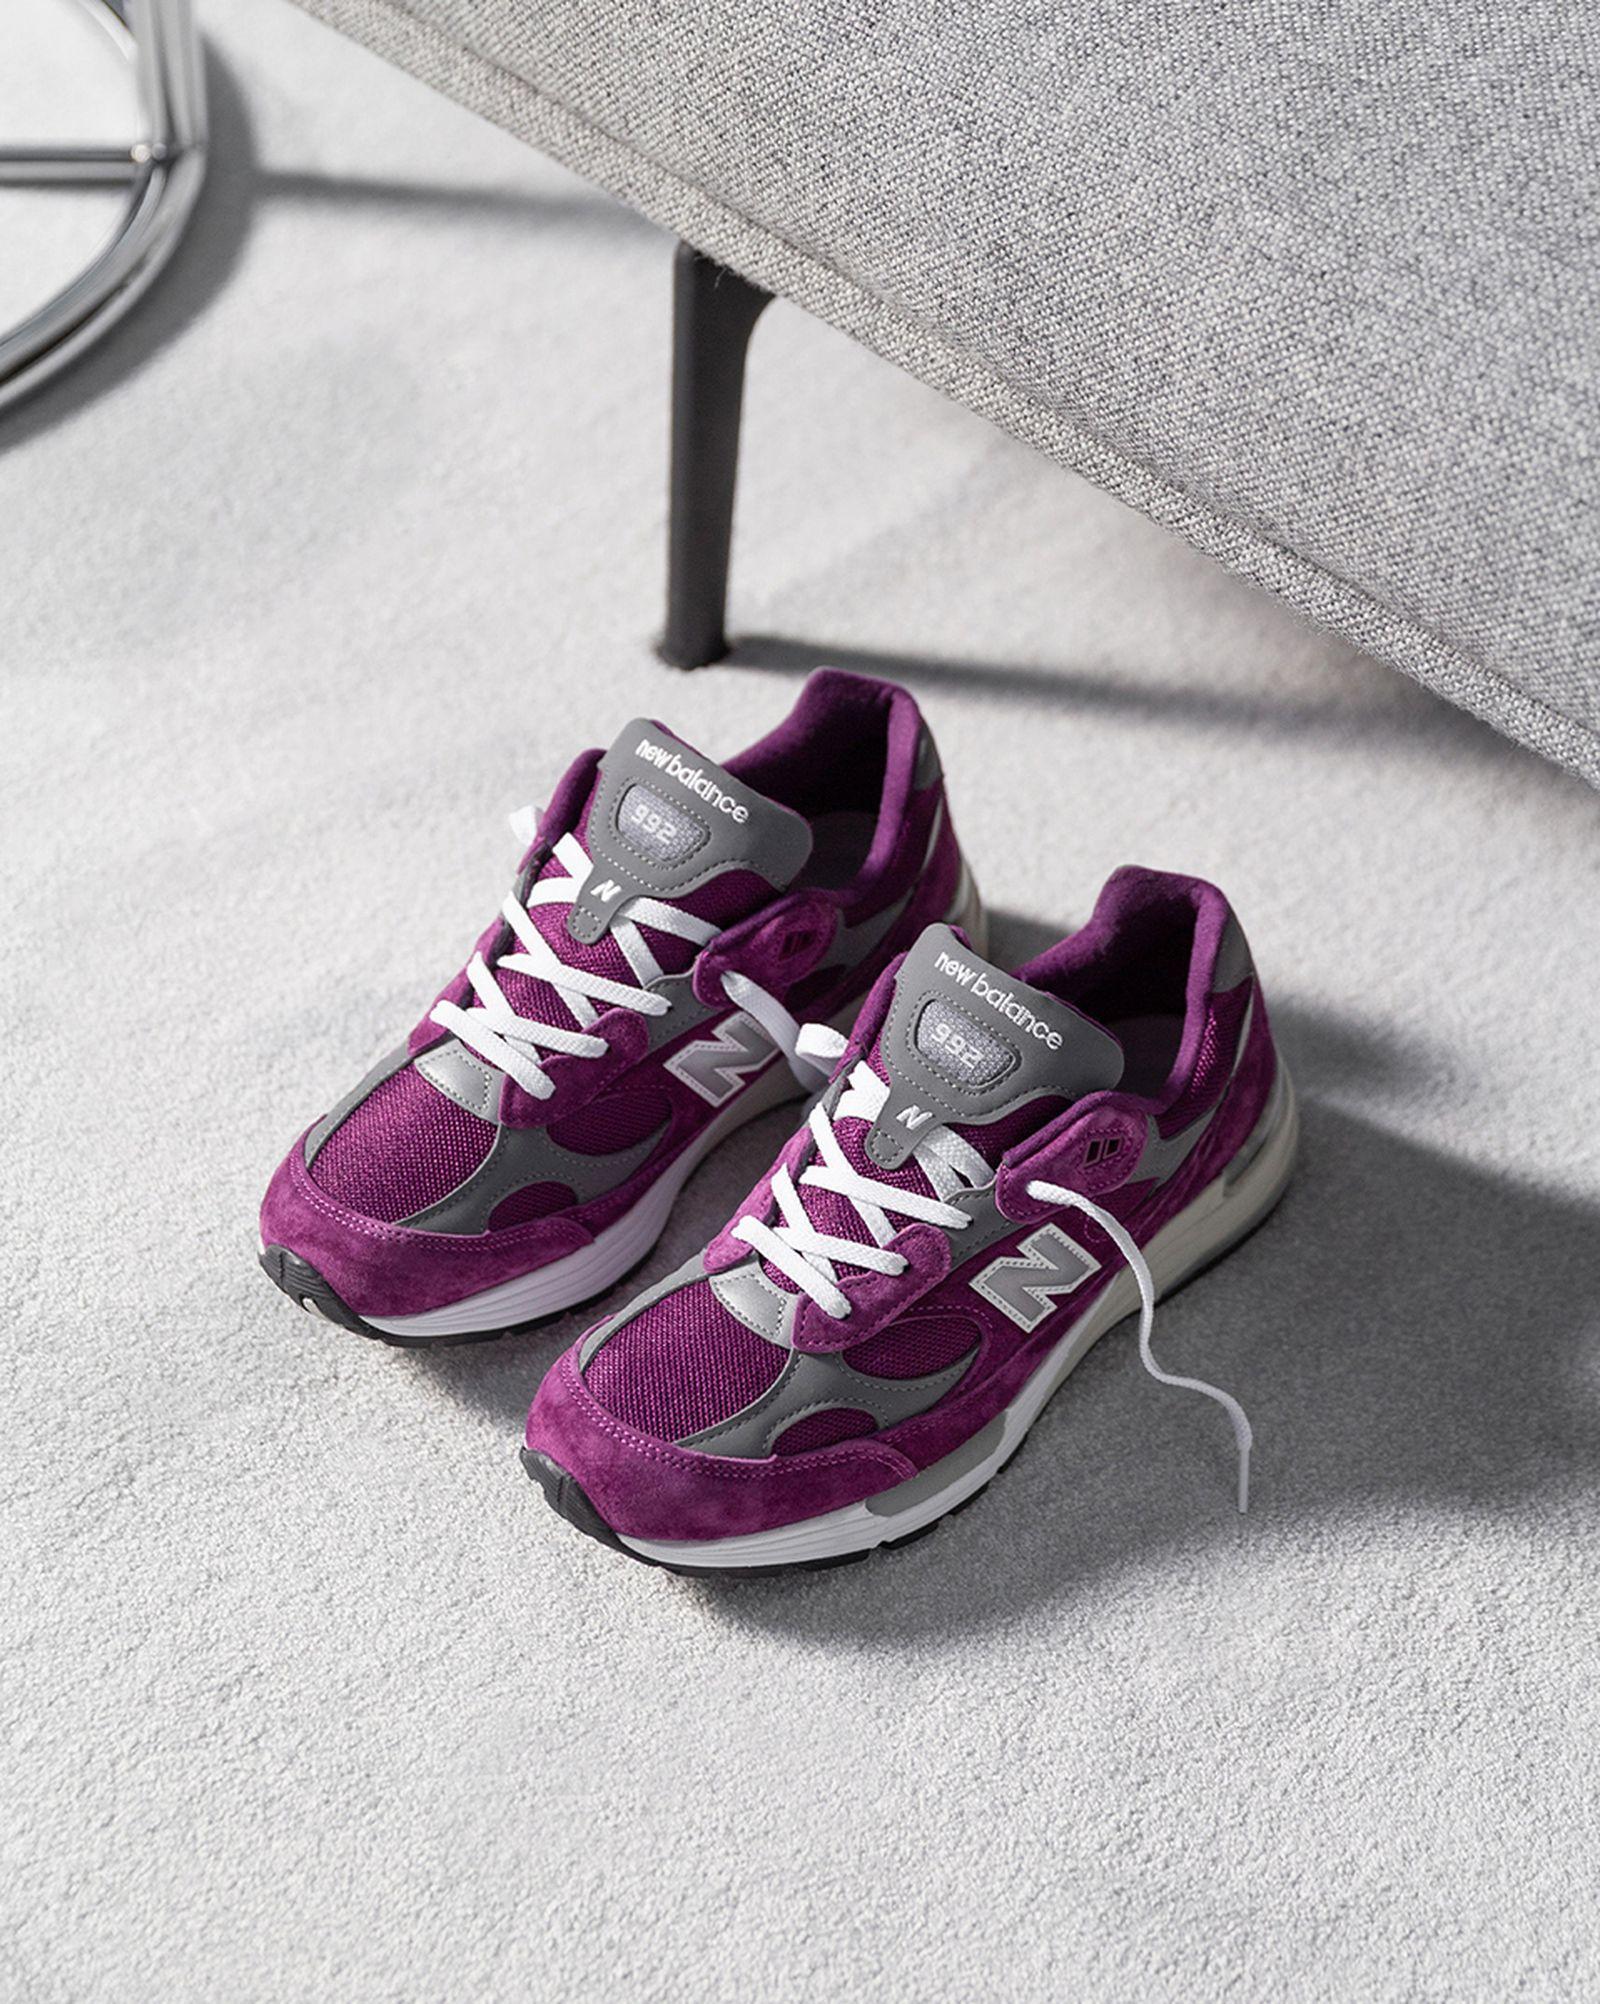 new-balance-992-purple-grey-release-date-price-05